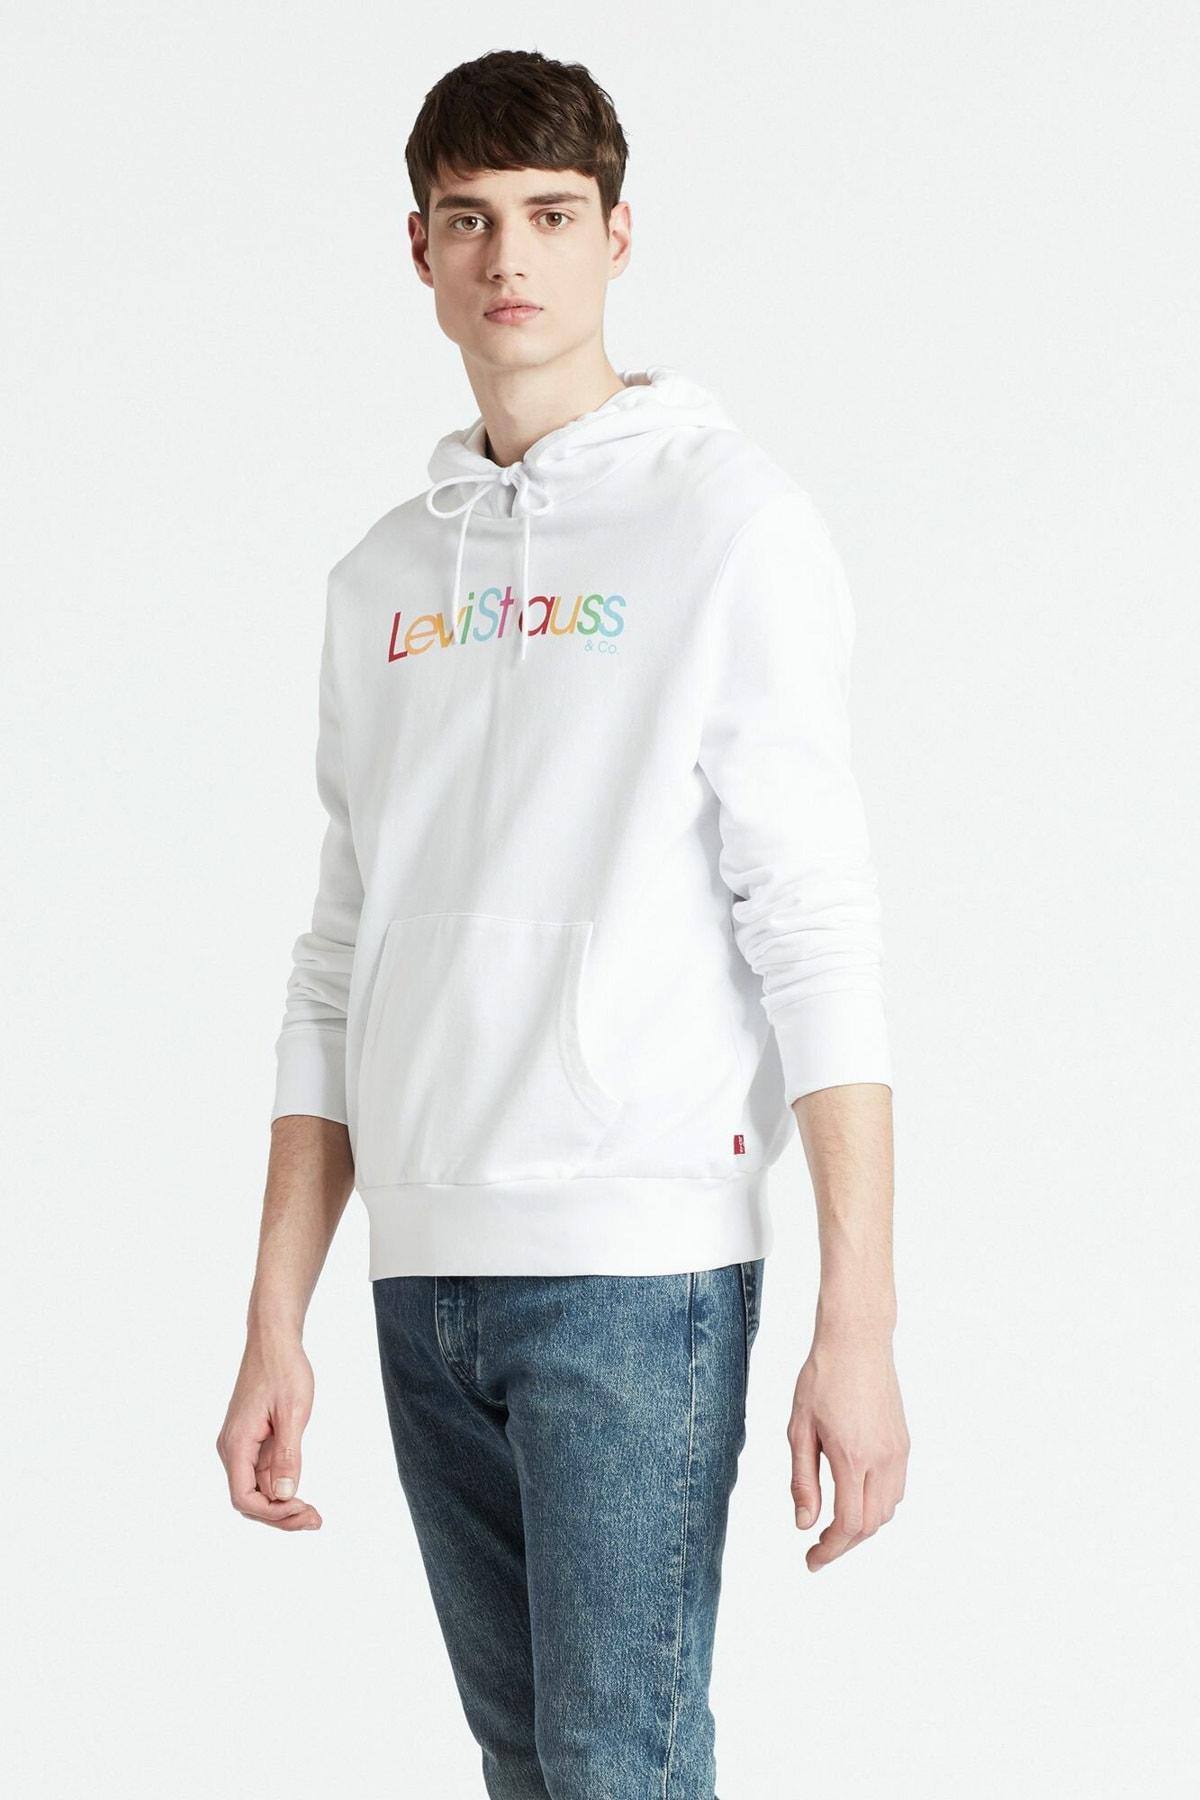 Levi's Erkek Beyaz Kapüşonlu  Sweatshirt 19622-0069 1